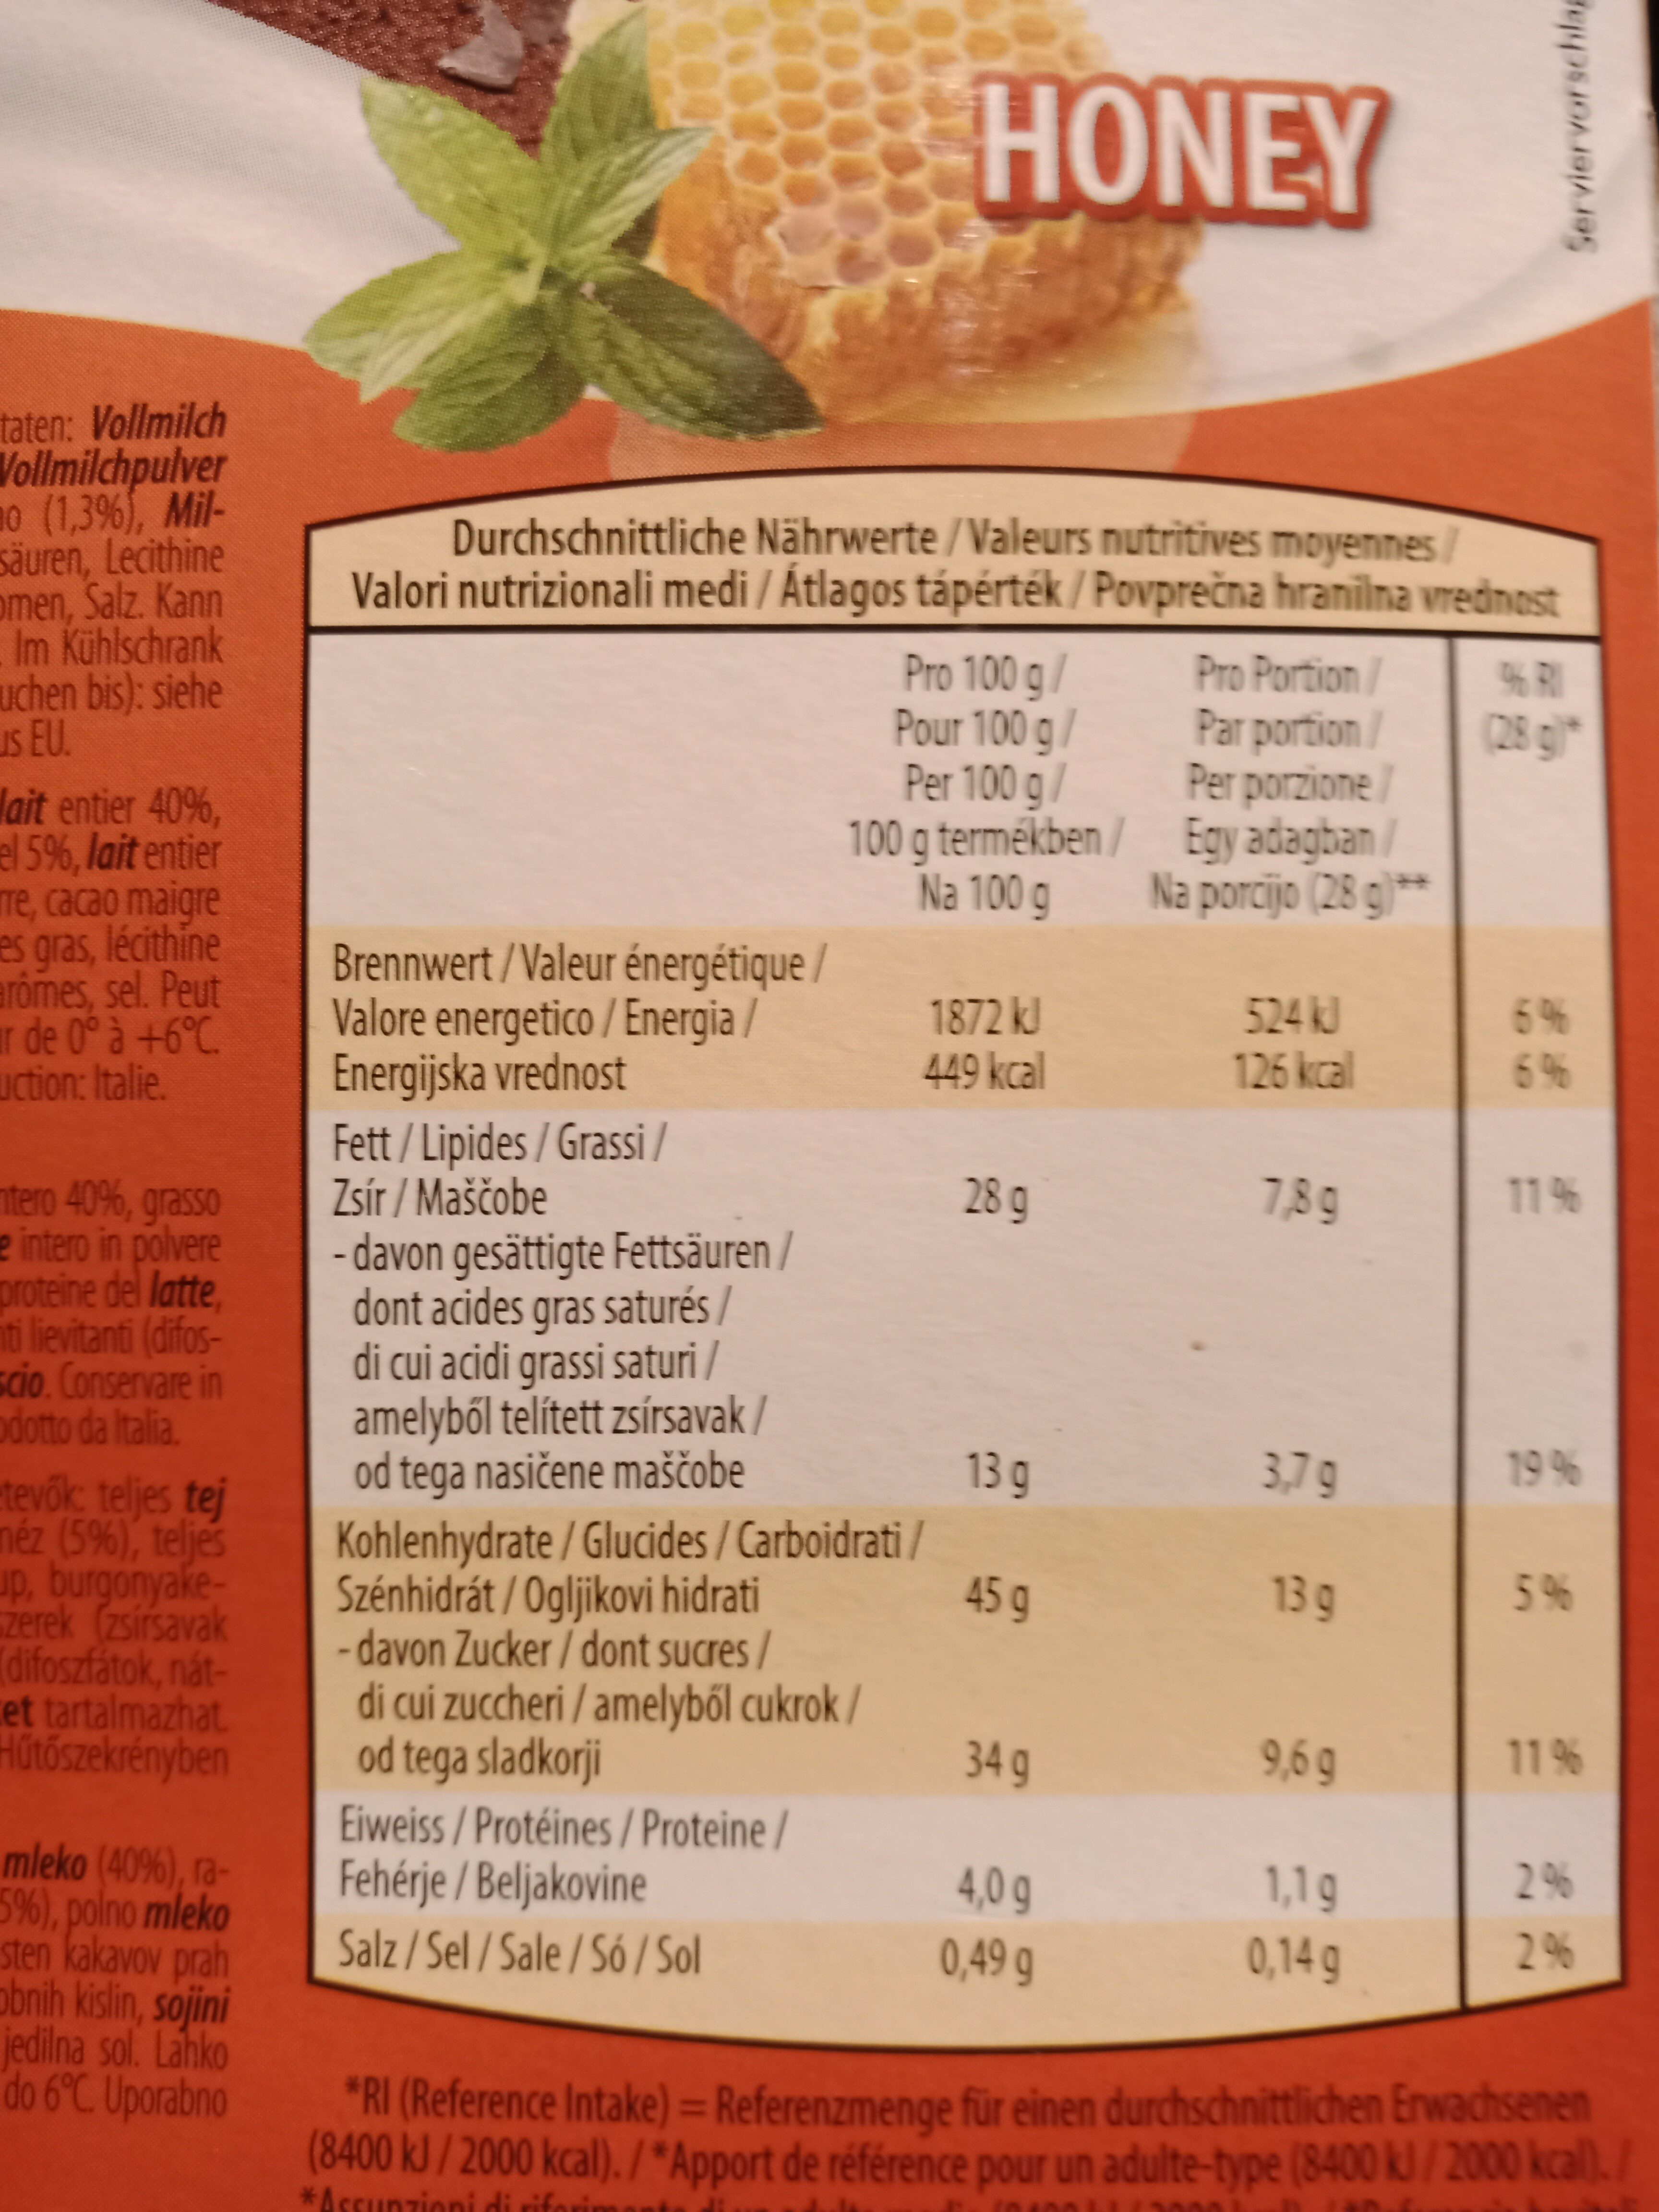 Milk snak honey - Ingredients - fr